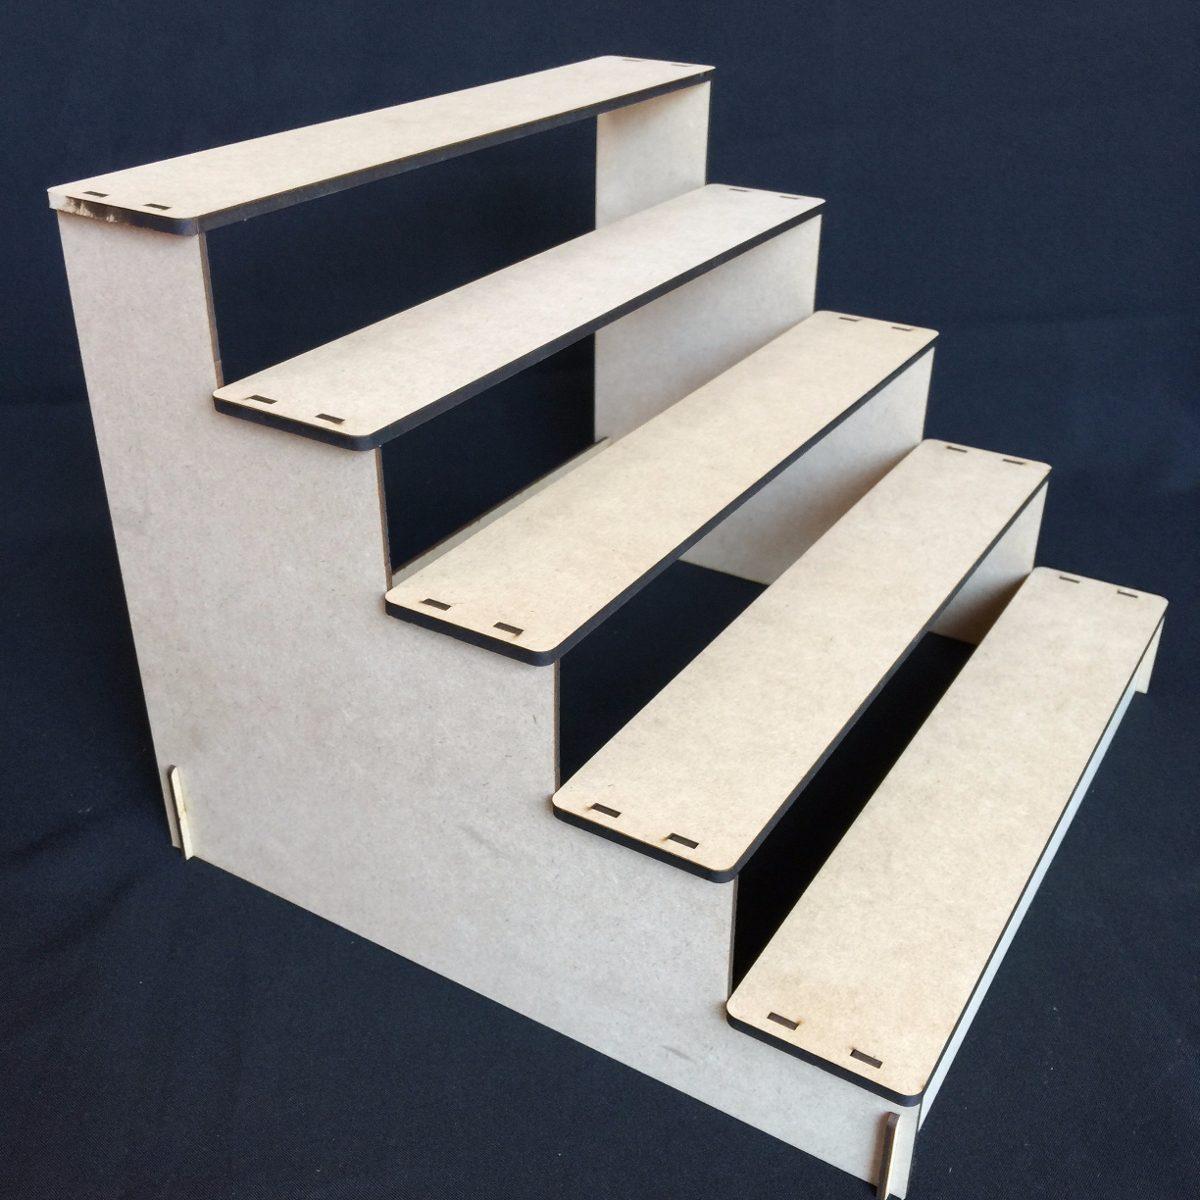 escalera para cupcakes muffins panques base mdf gmbs027 en mercado libre. Black Bedroom Furniture Sets. Home Design Ideas